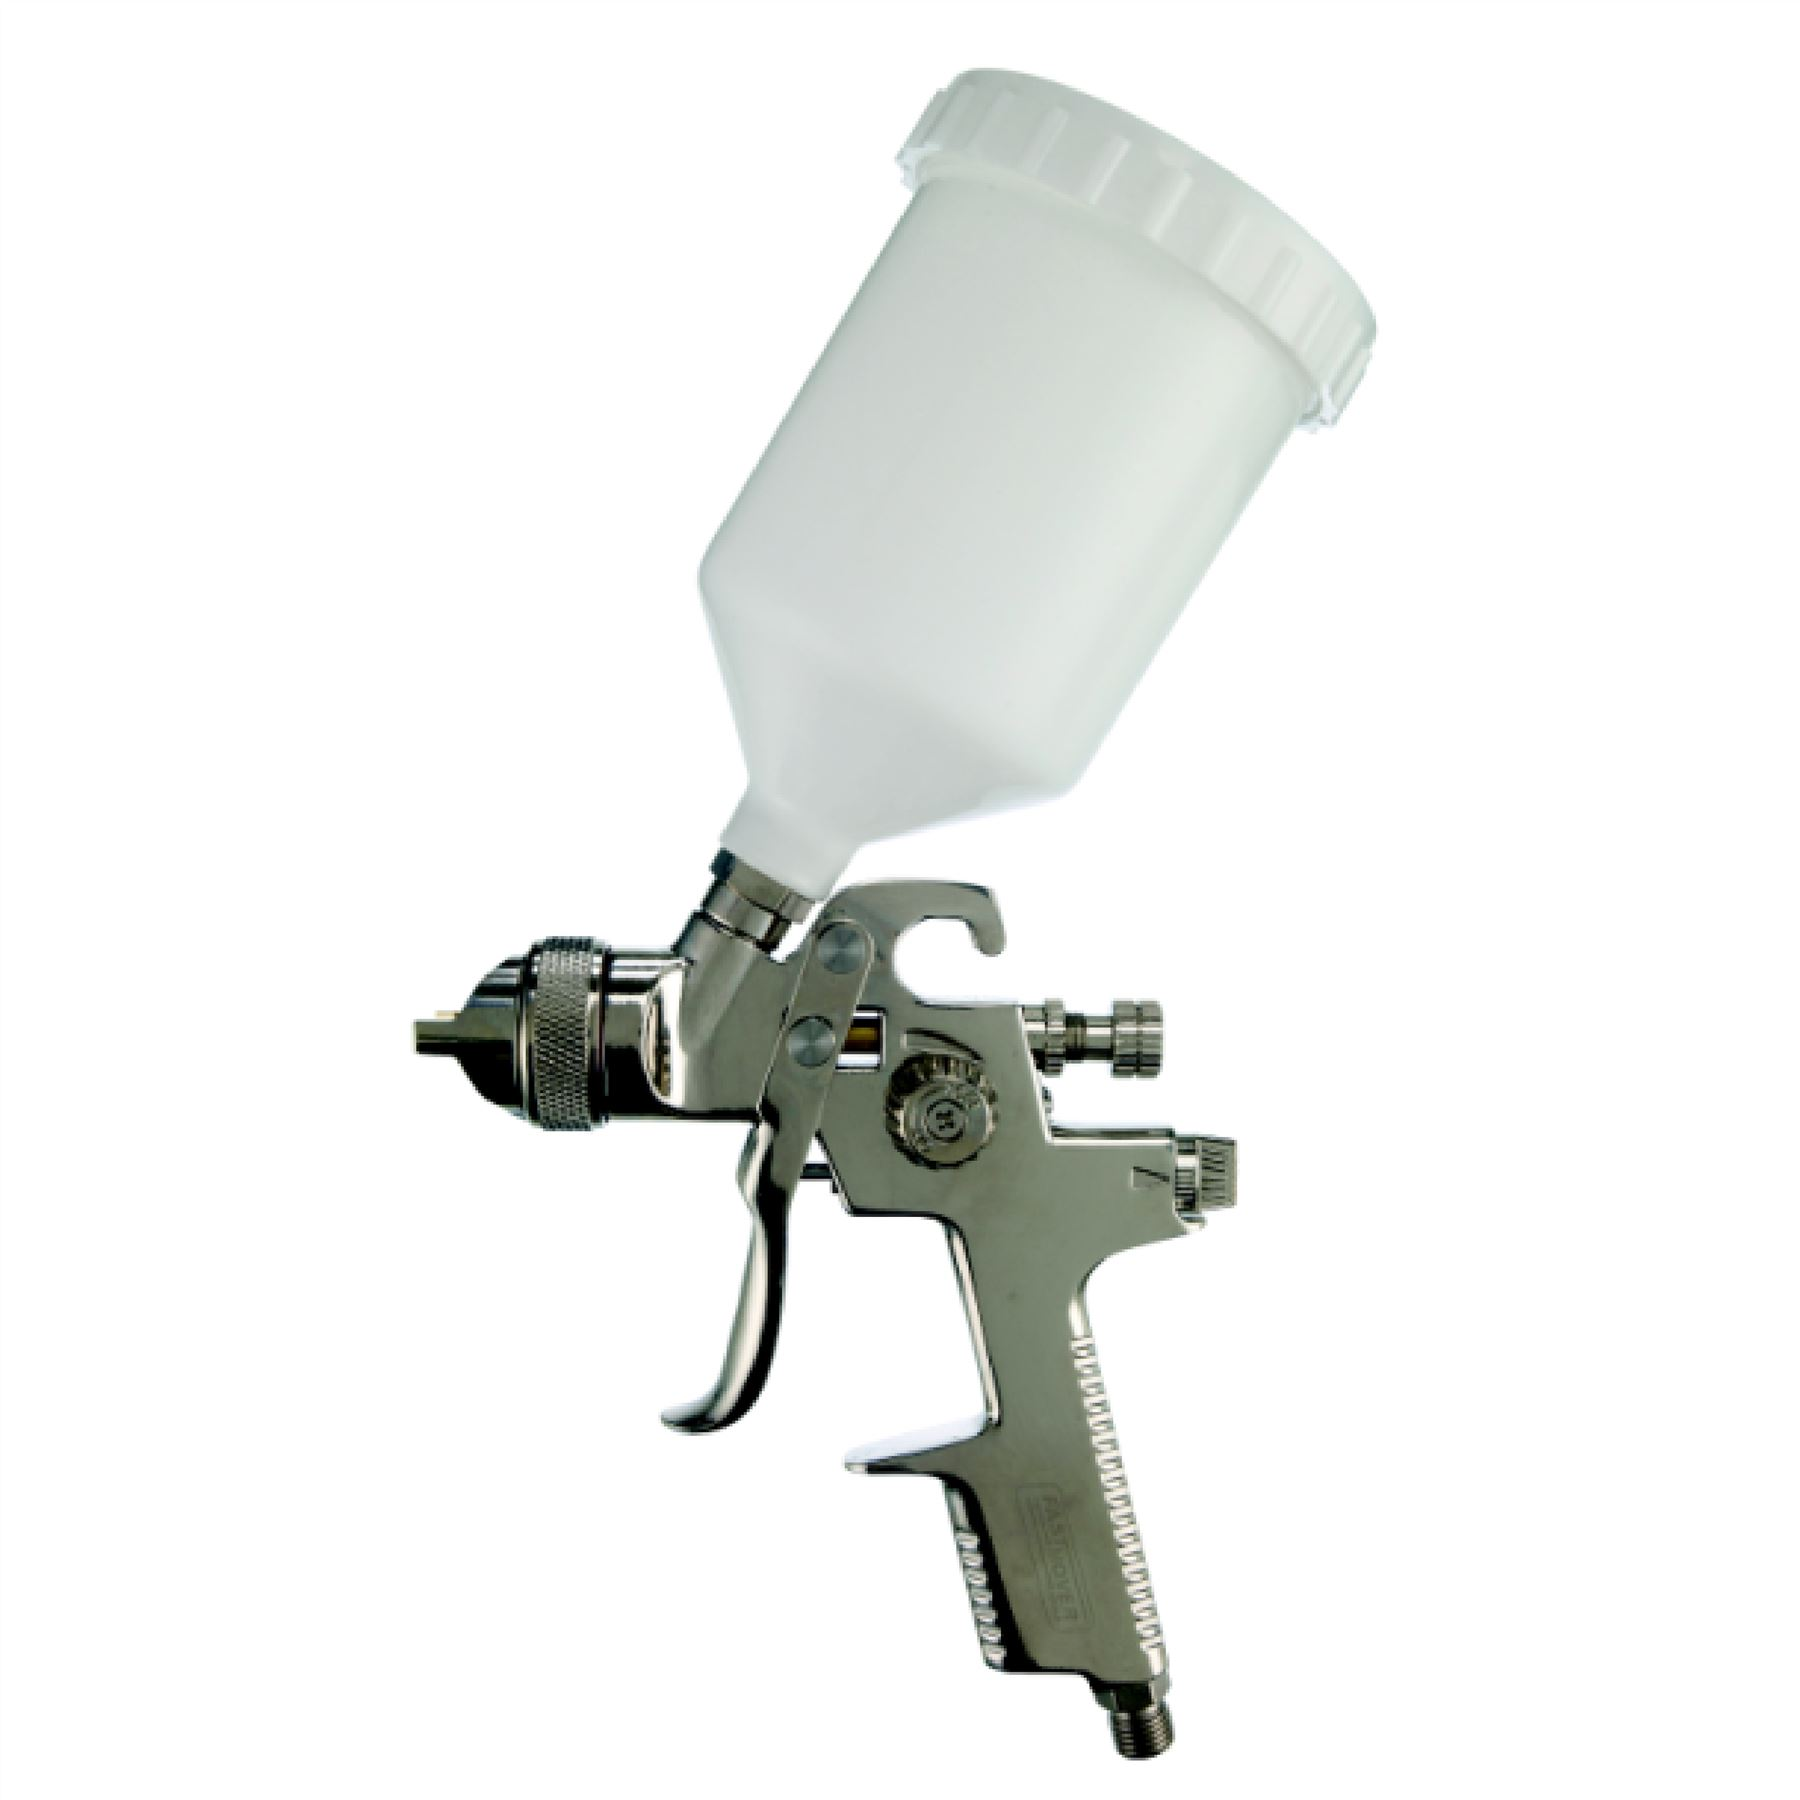 Best Hvlp Paint Sprayer For Furniture Uk